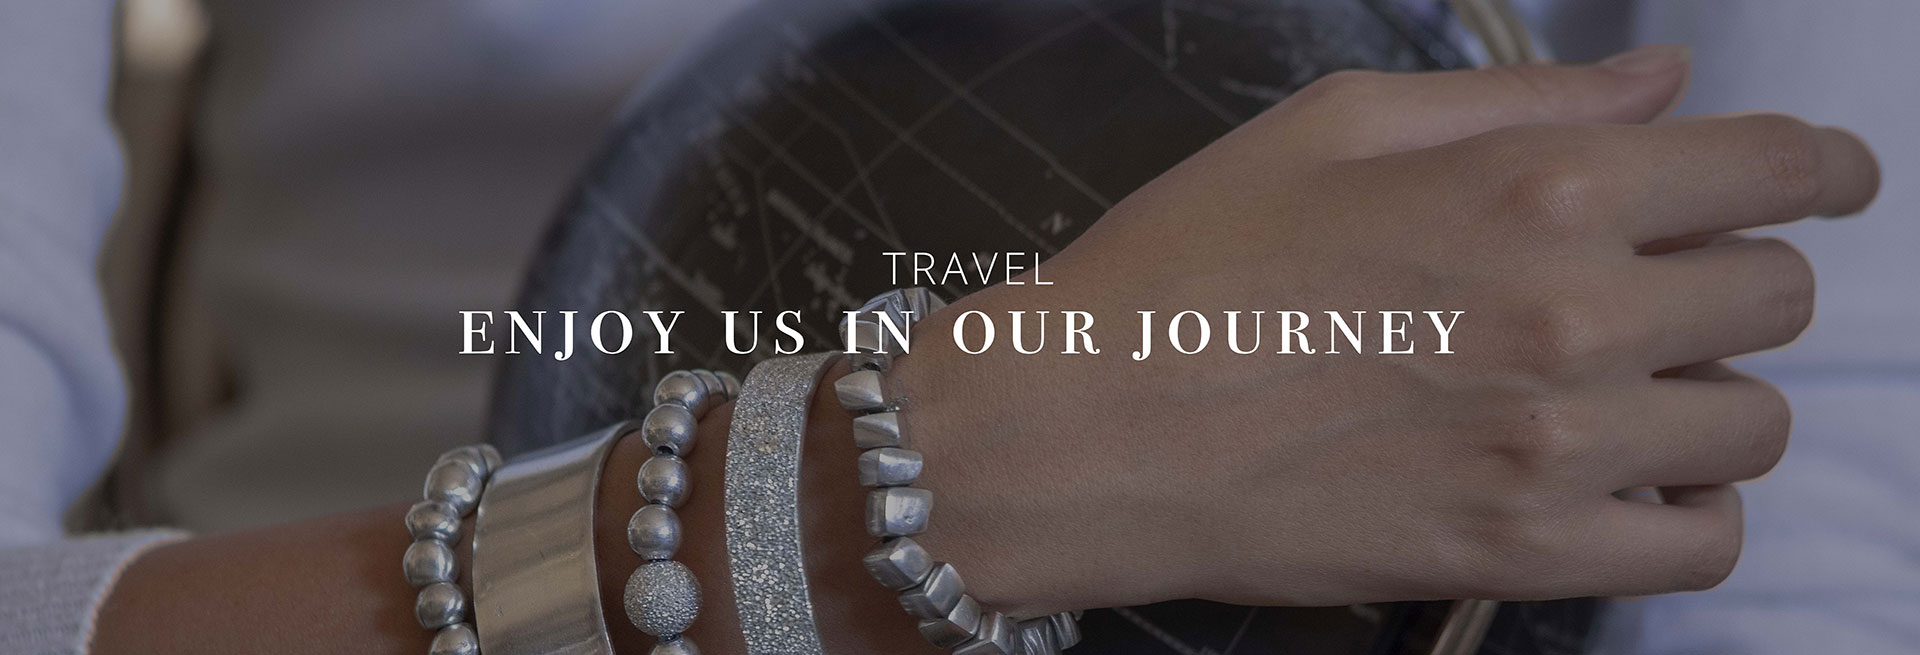 blog category travel